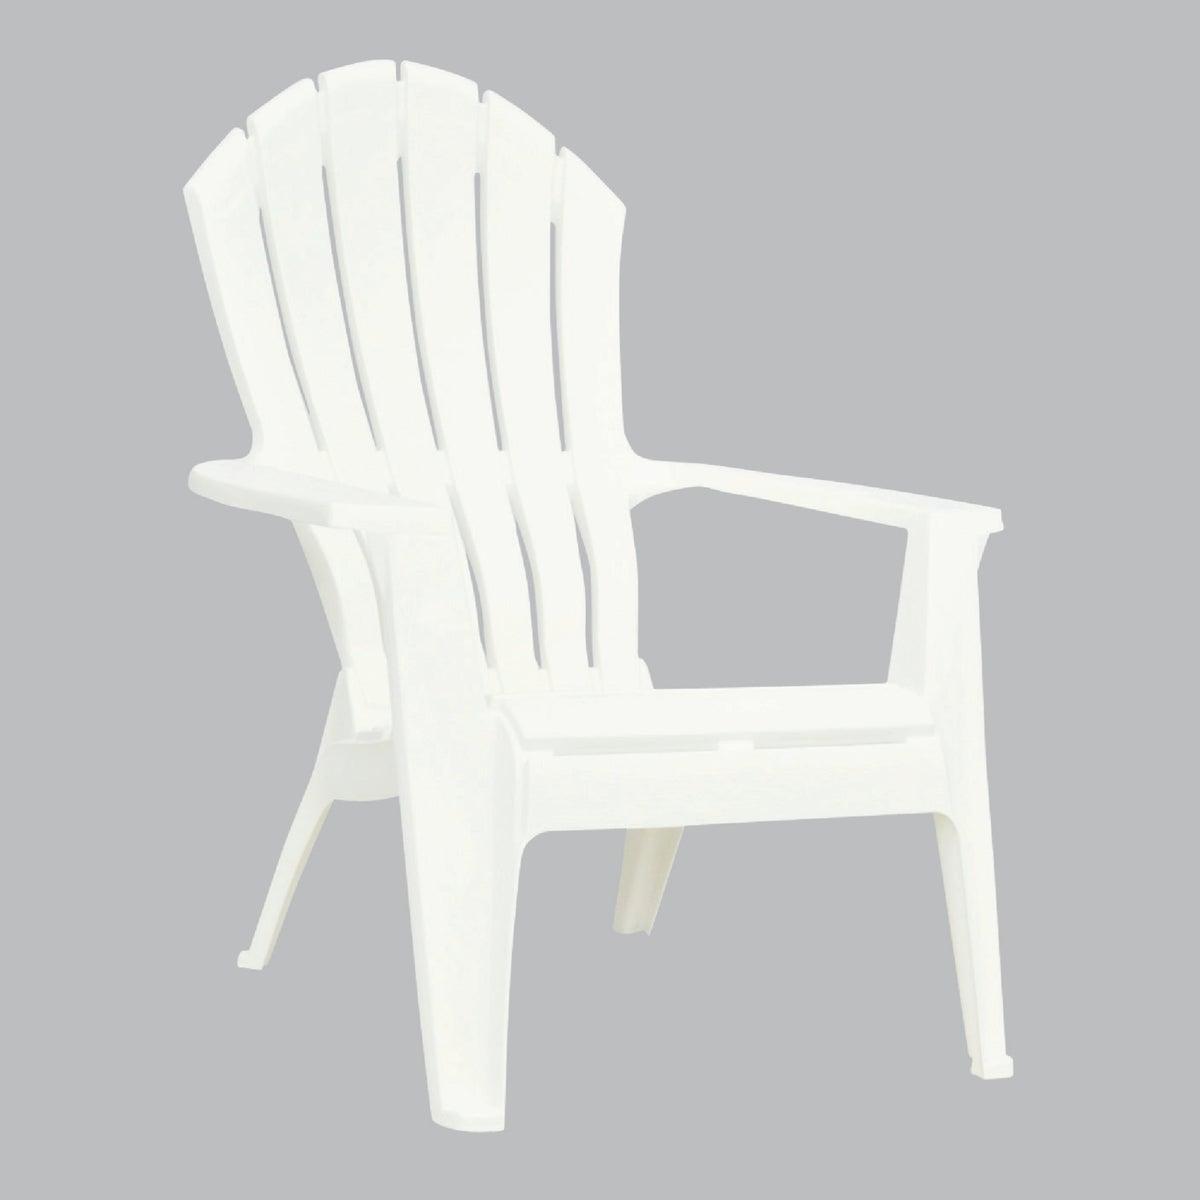 Adams Mfg./Patio Furn. WHITE ERGO ADIRON CHAIR 8371-48-3700